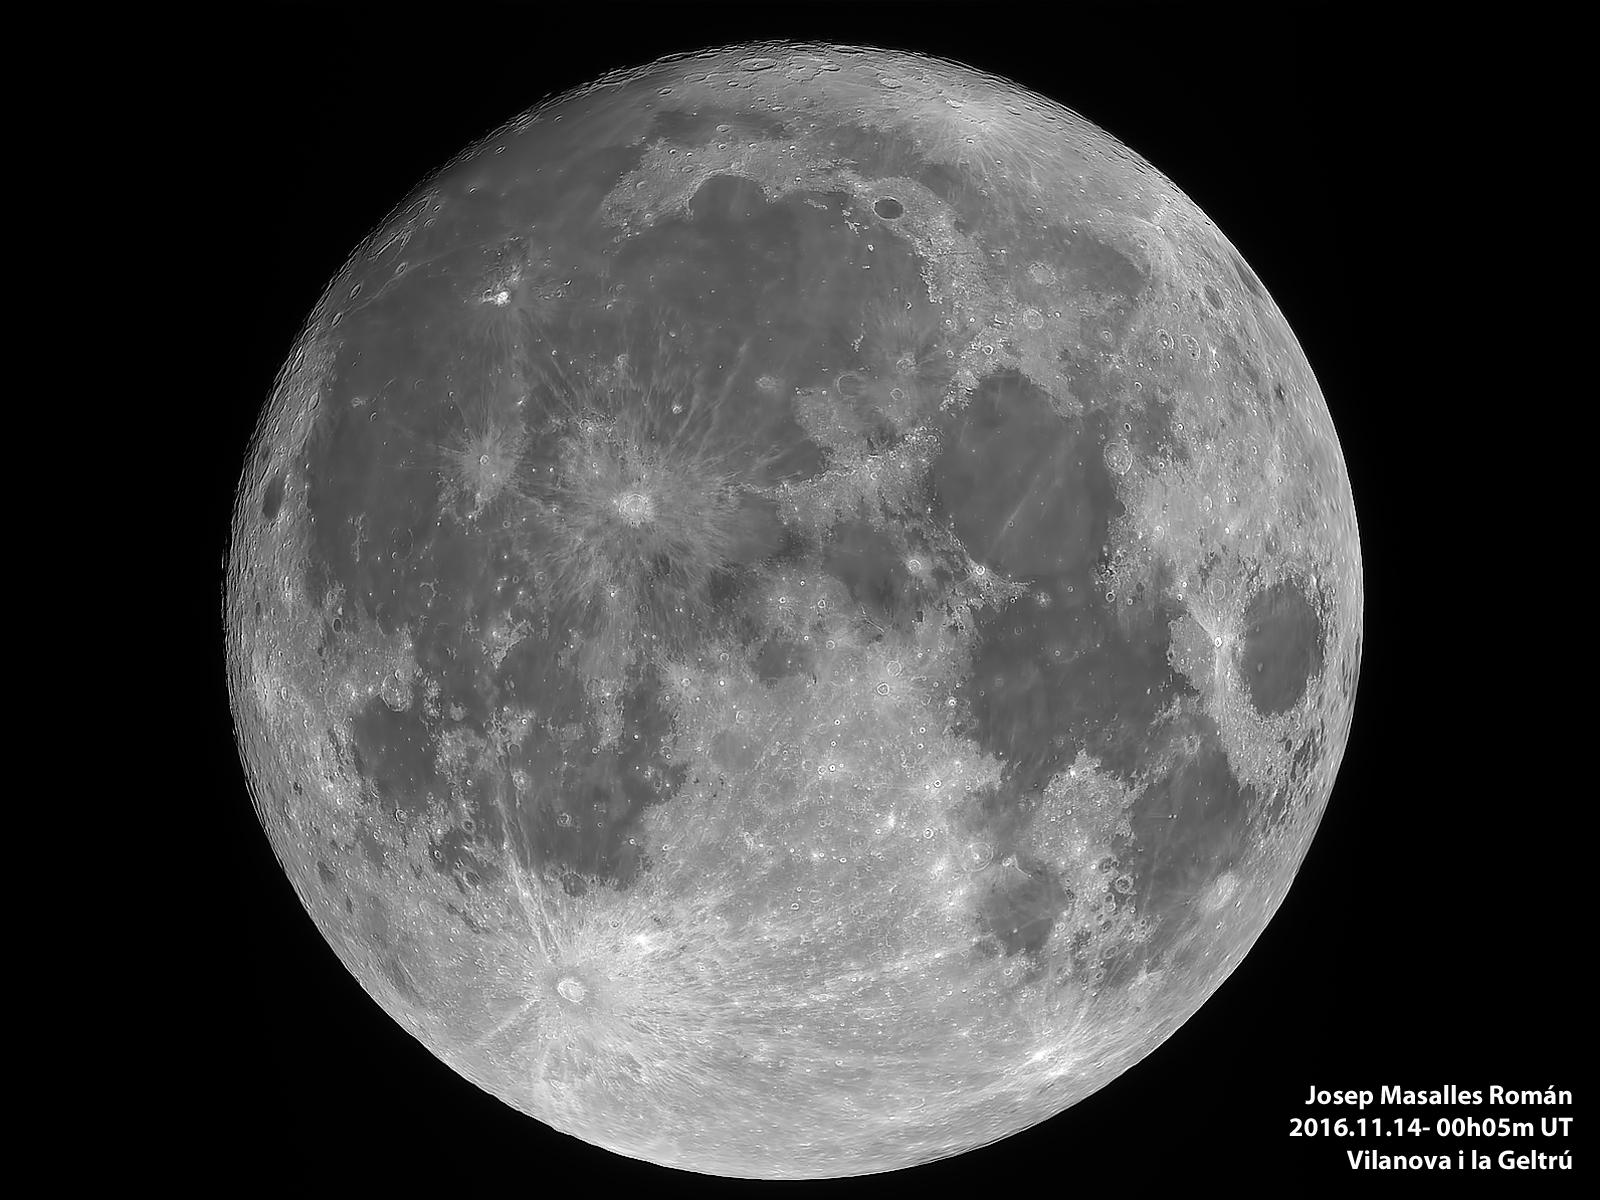 20161114-lluna-00h05mut-jmr2s-filtre-uhc